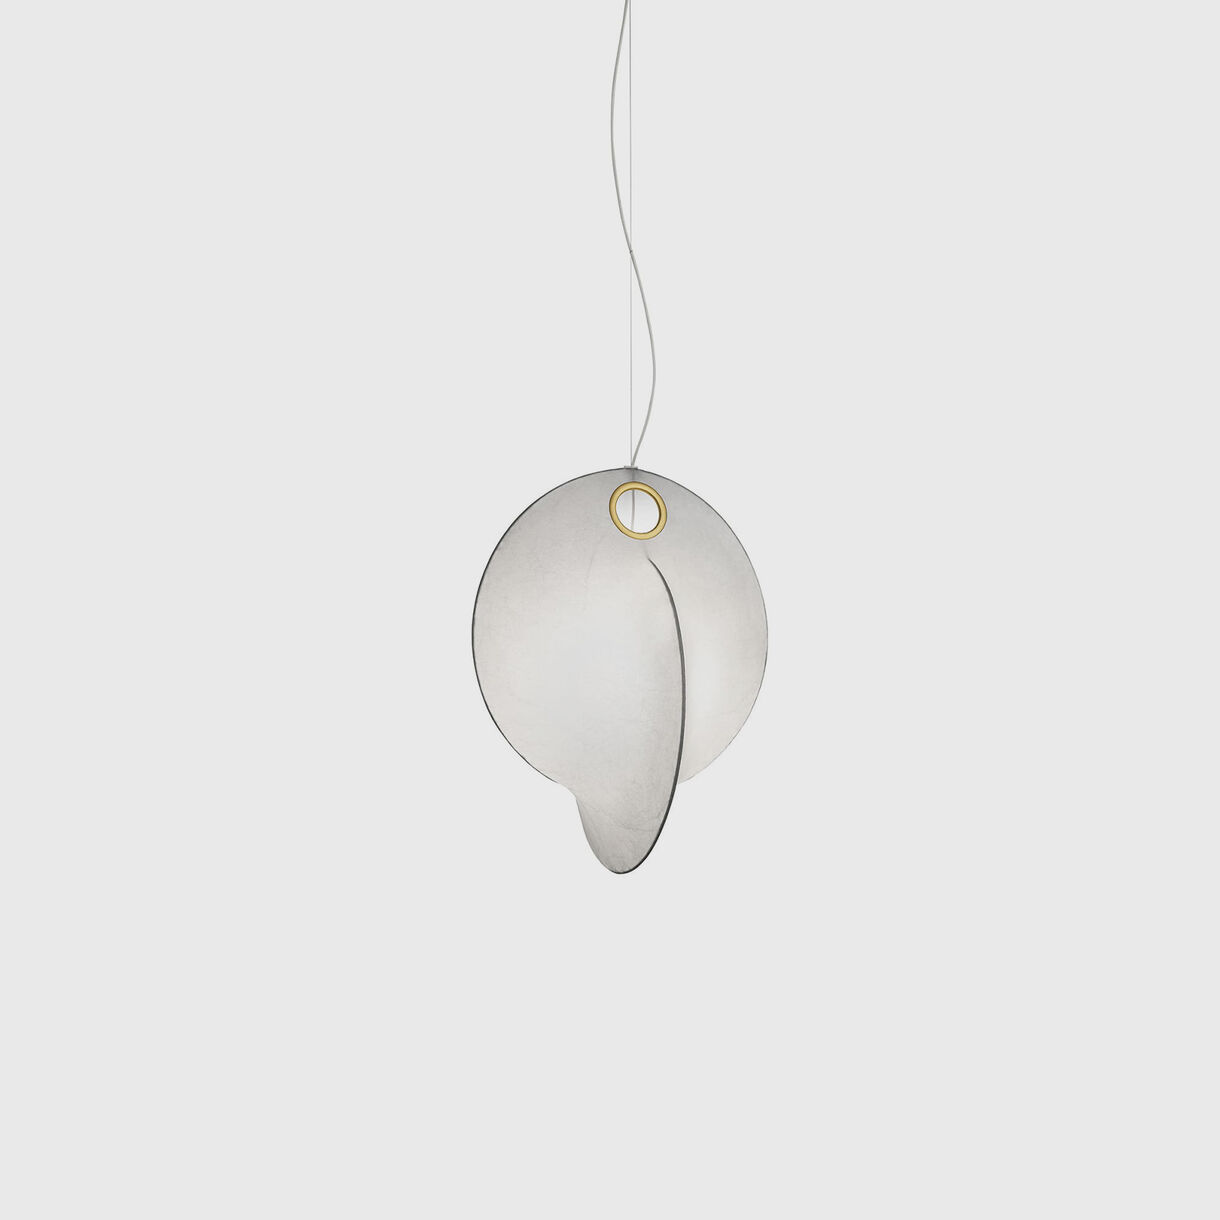 Overlap Pendant Lamp, S1